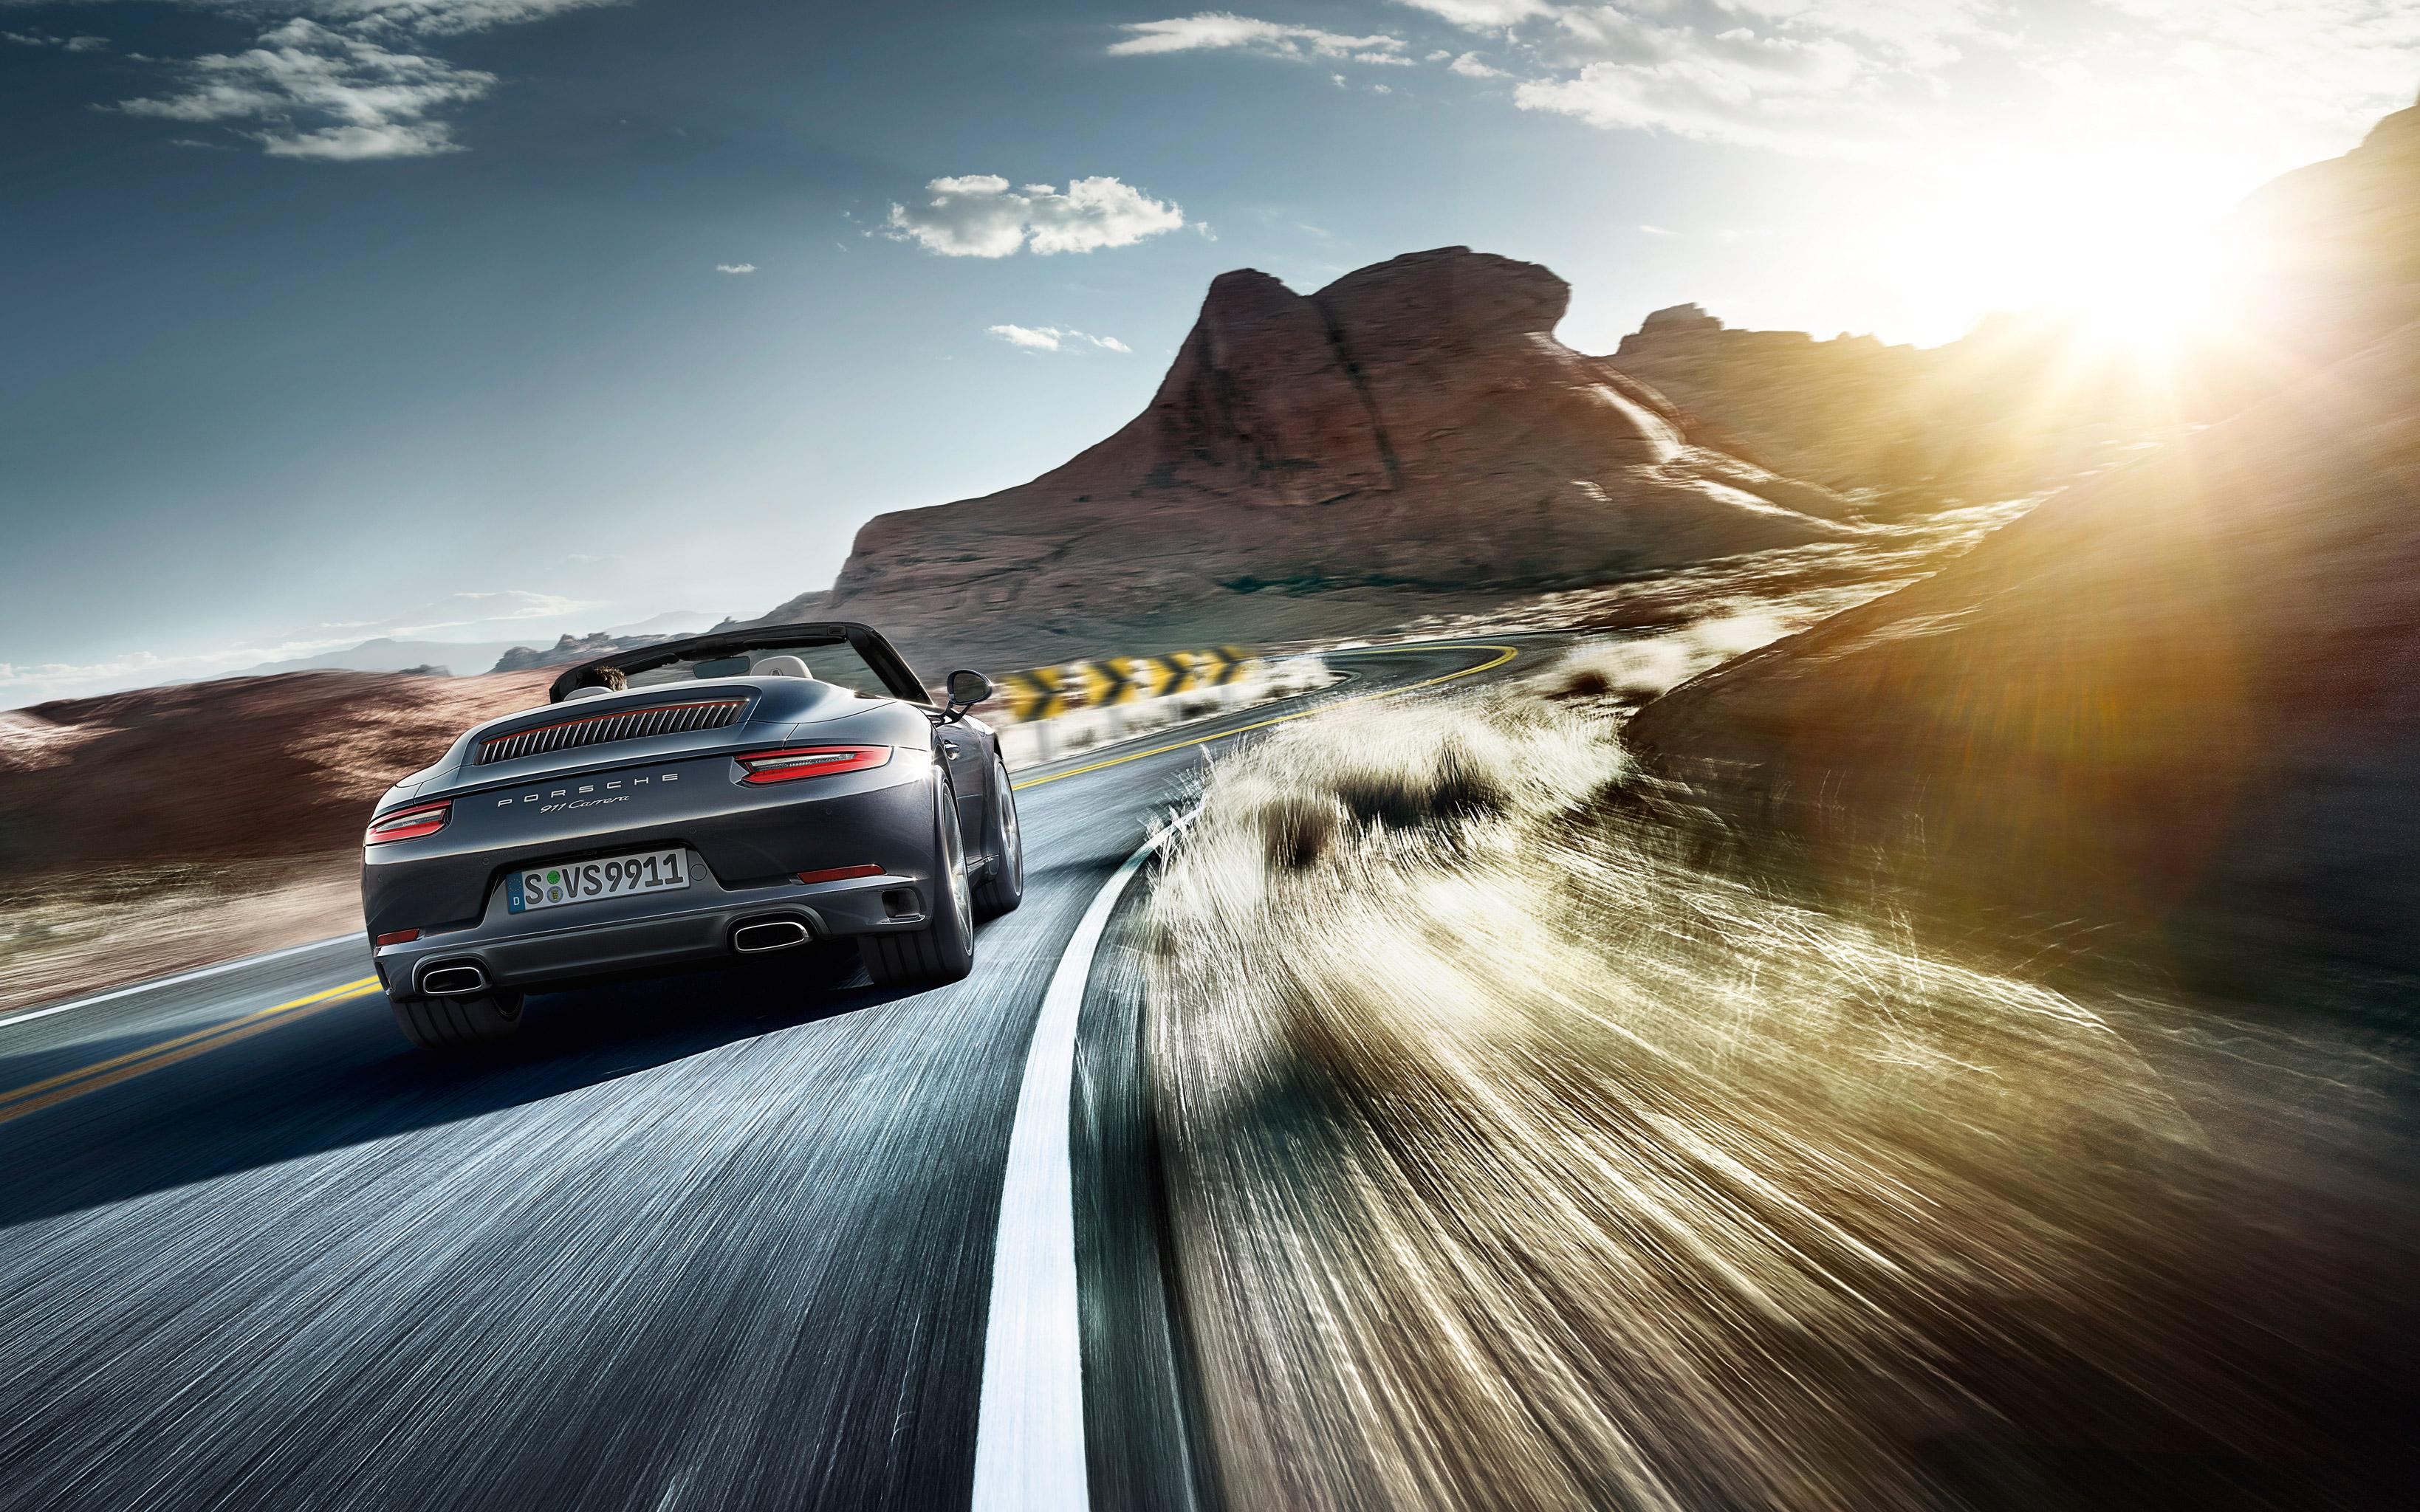 2048x2048 Anthem Ipad Air Hd 4k Wallpapers Images: 2048x2048 2017 Porsche 911 Carrera Ipad Air HD 4k